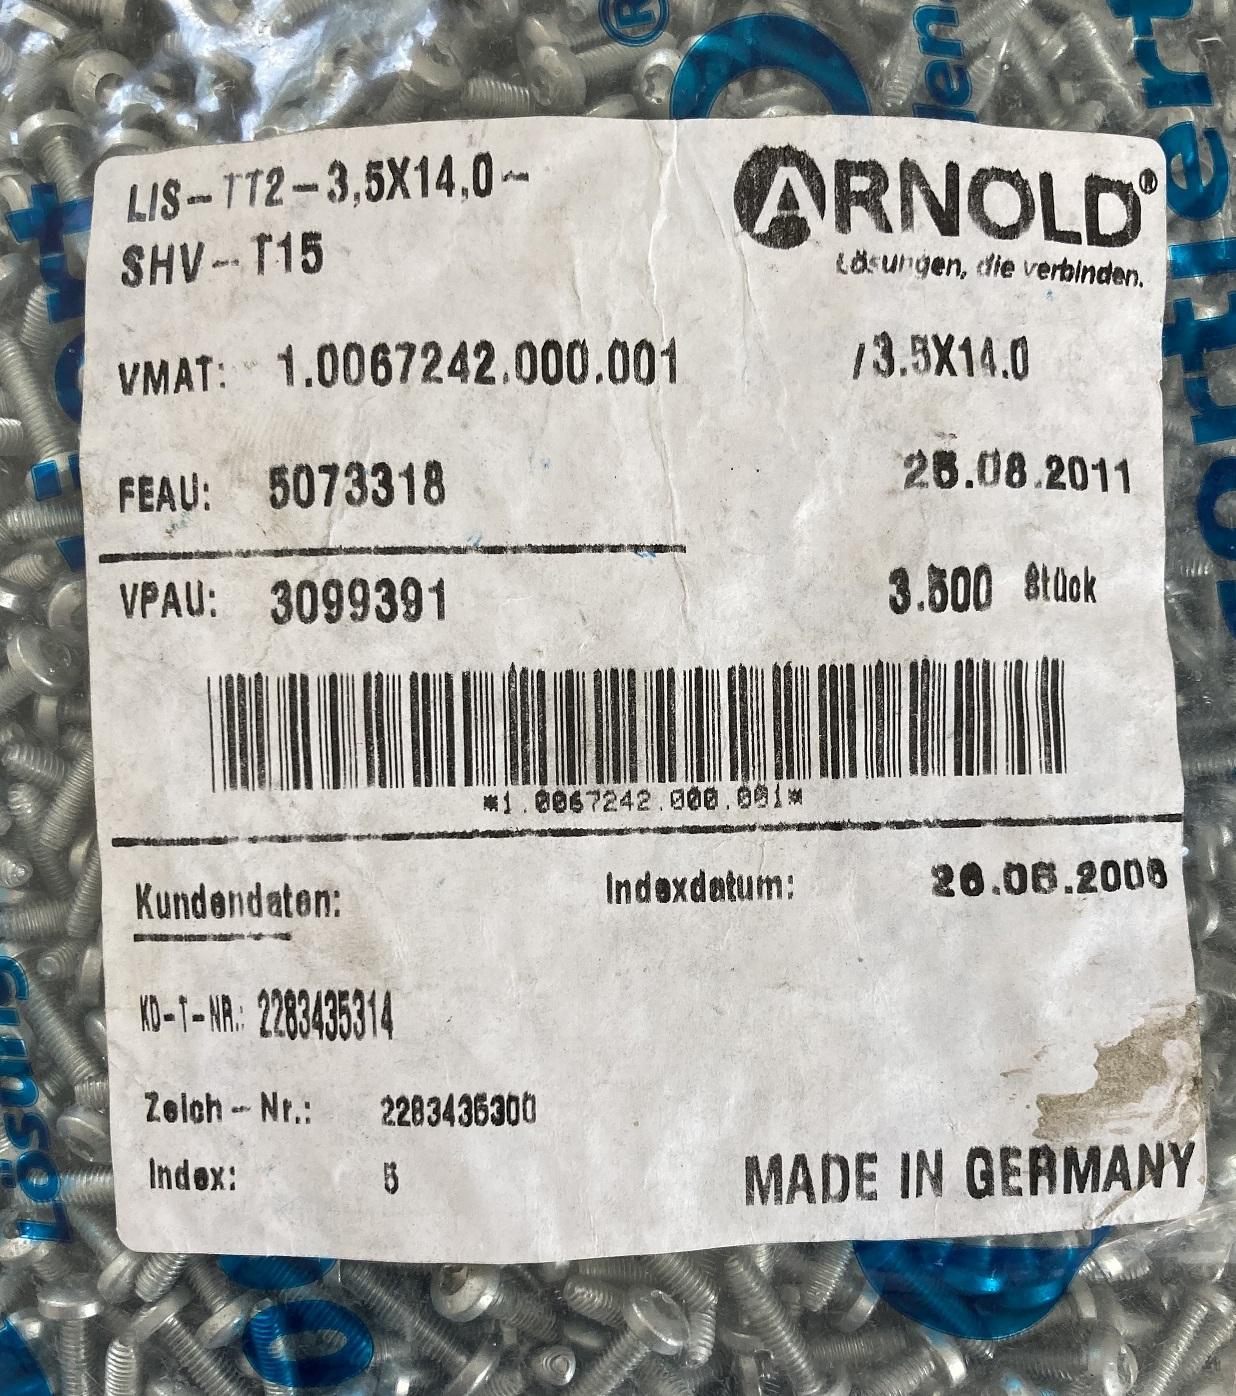 arnold-35-14